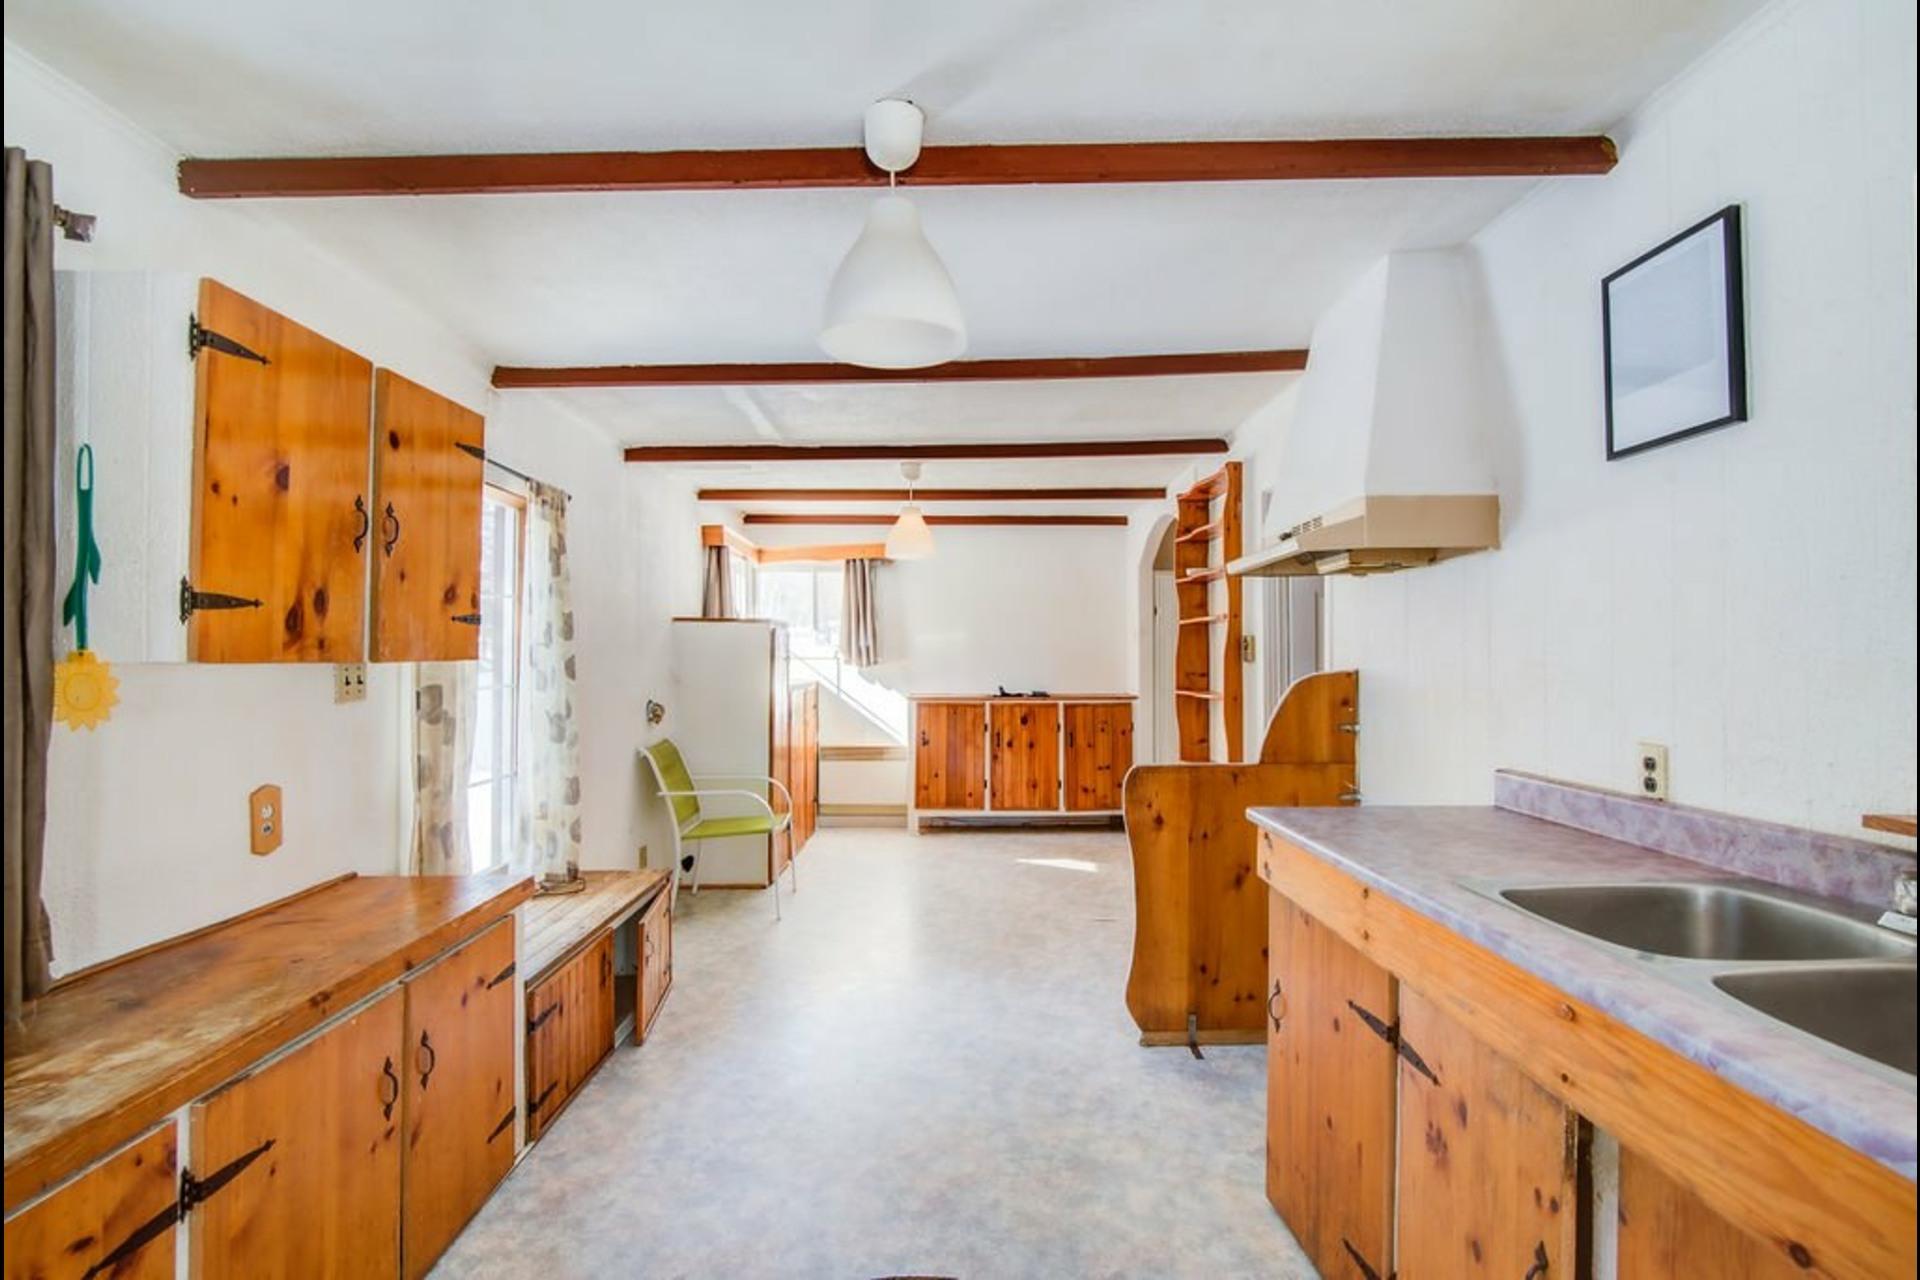 image 8 - House For sale Saint-Calixte - 8 rooms